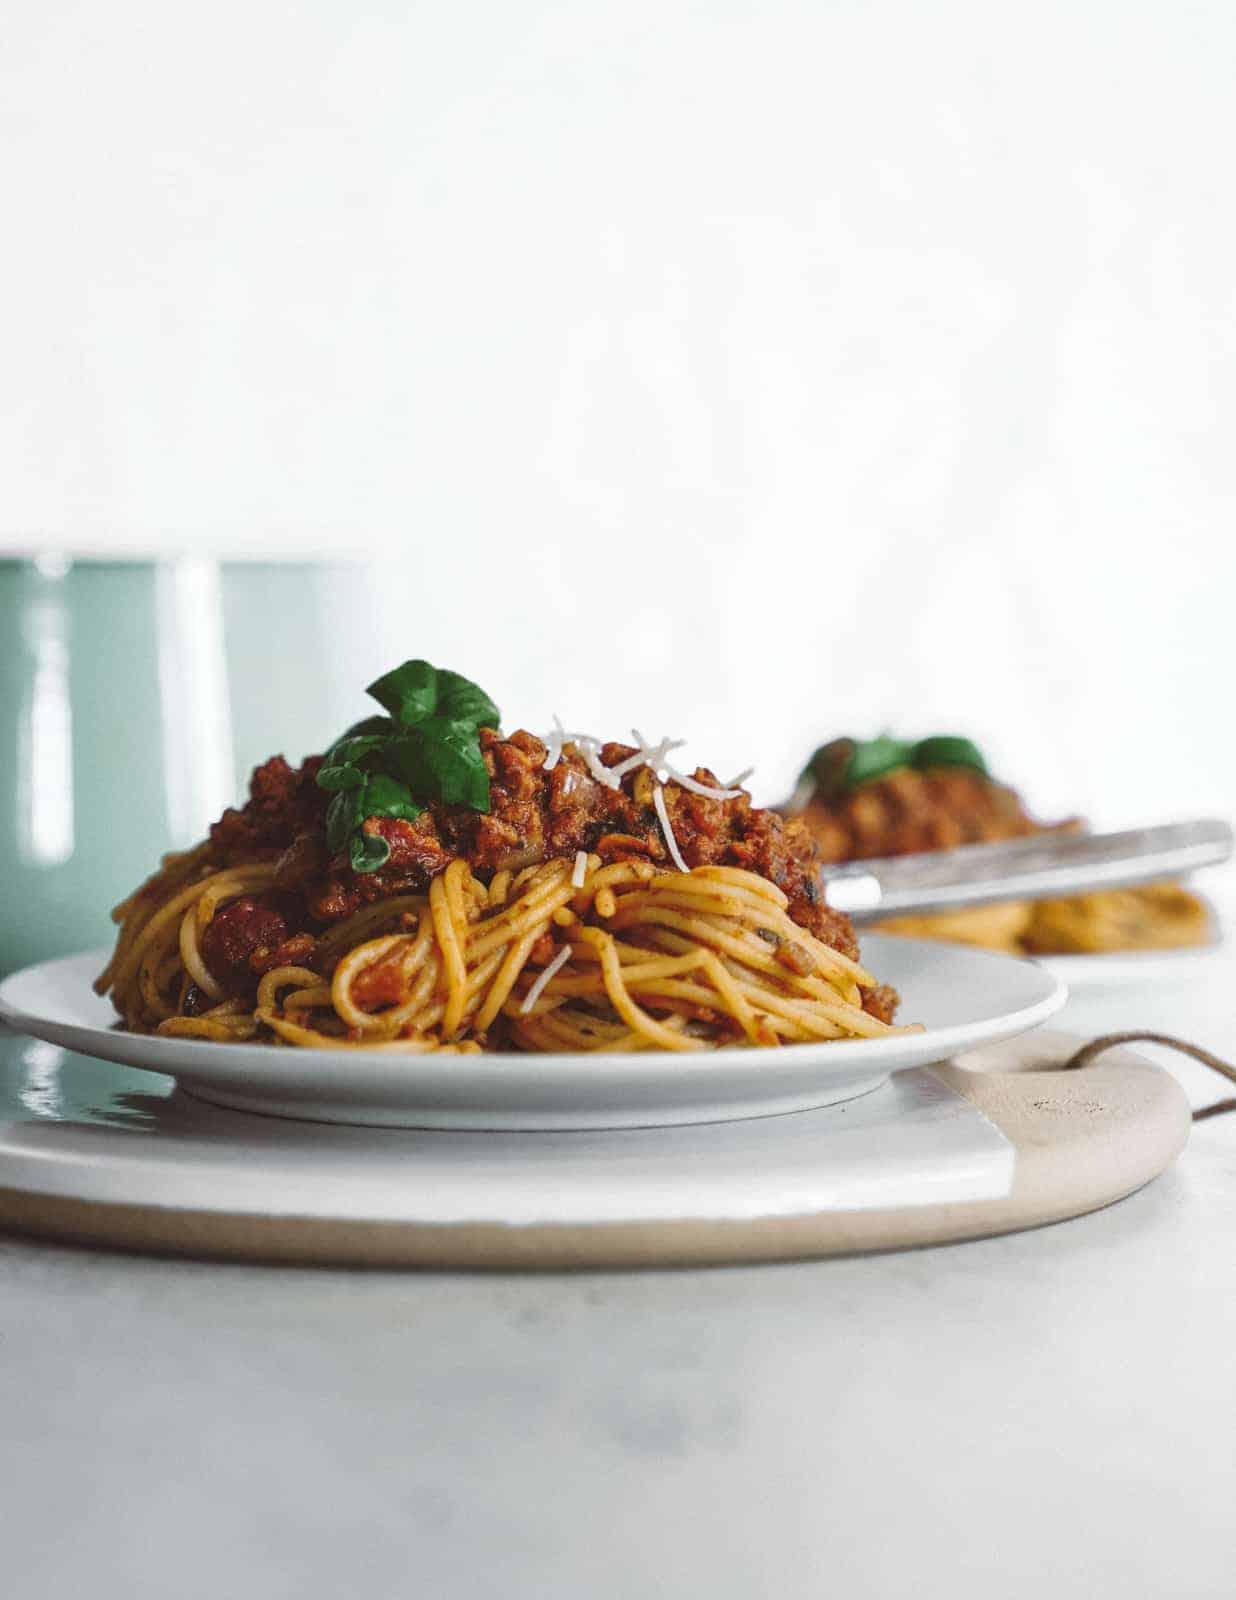 Pile of vegan spaghetti on white plate